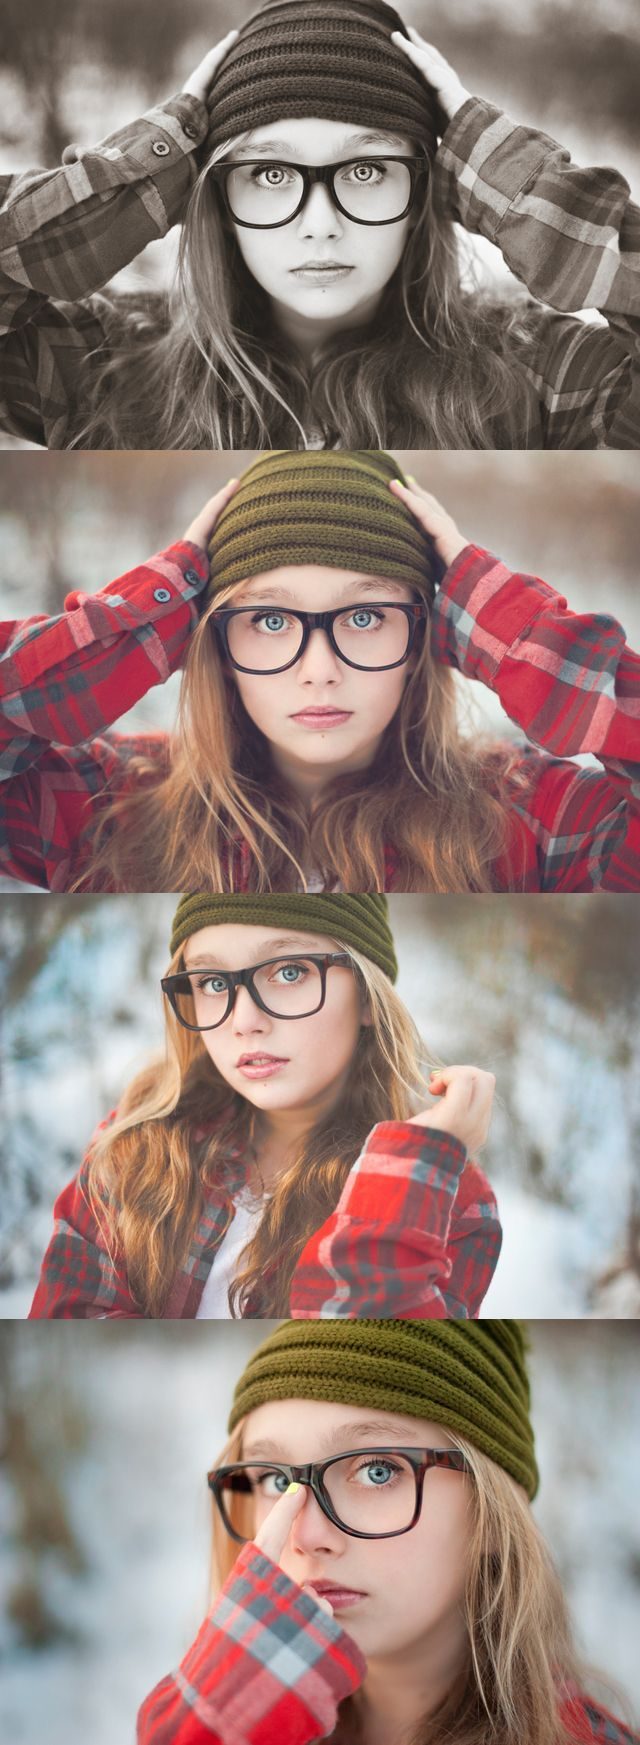 Stephanie Marie Photography|Portrait Photography Inspiration